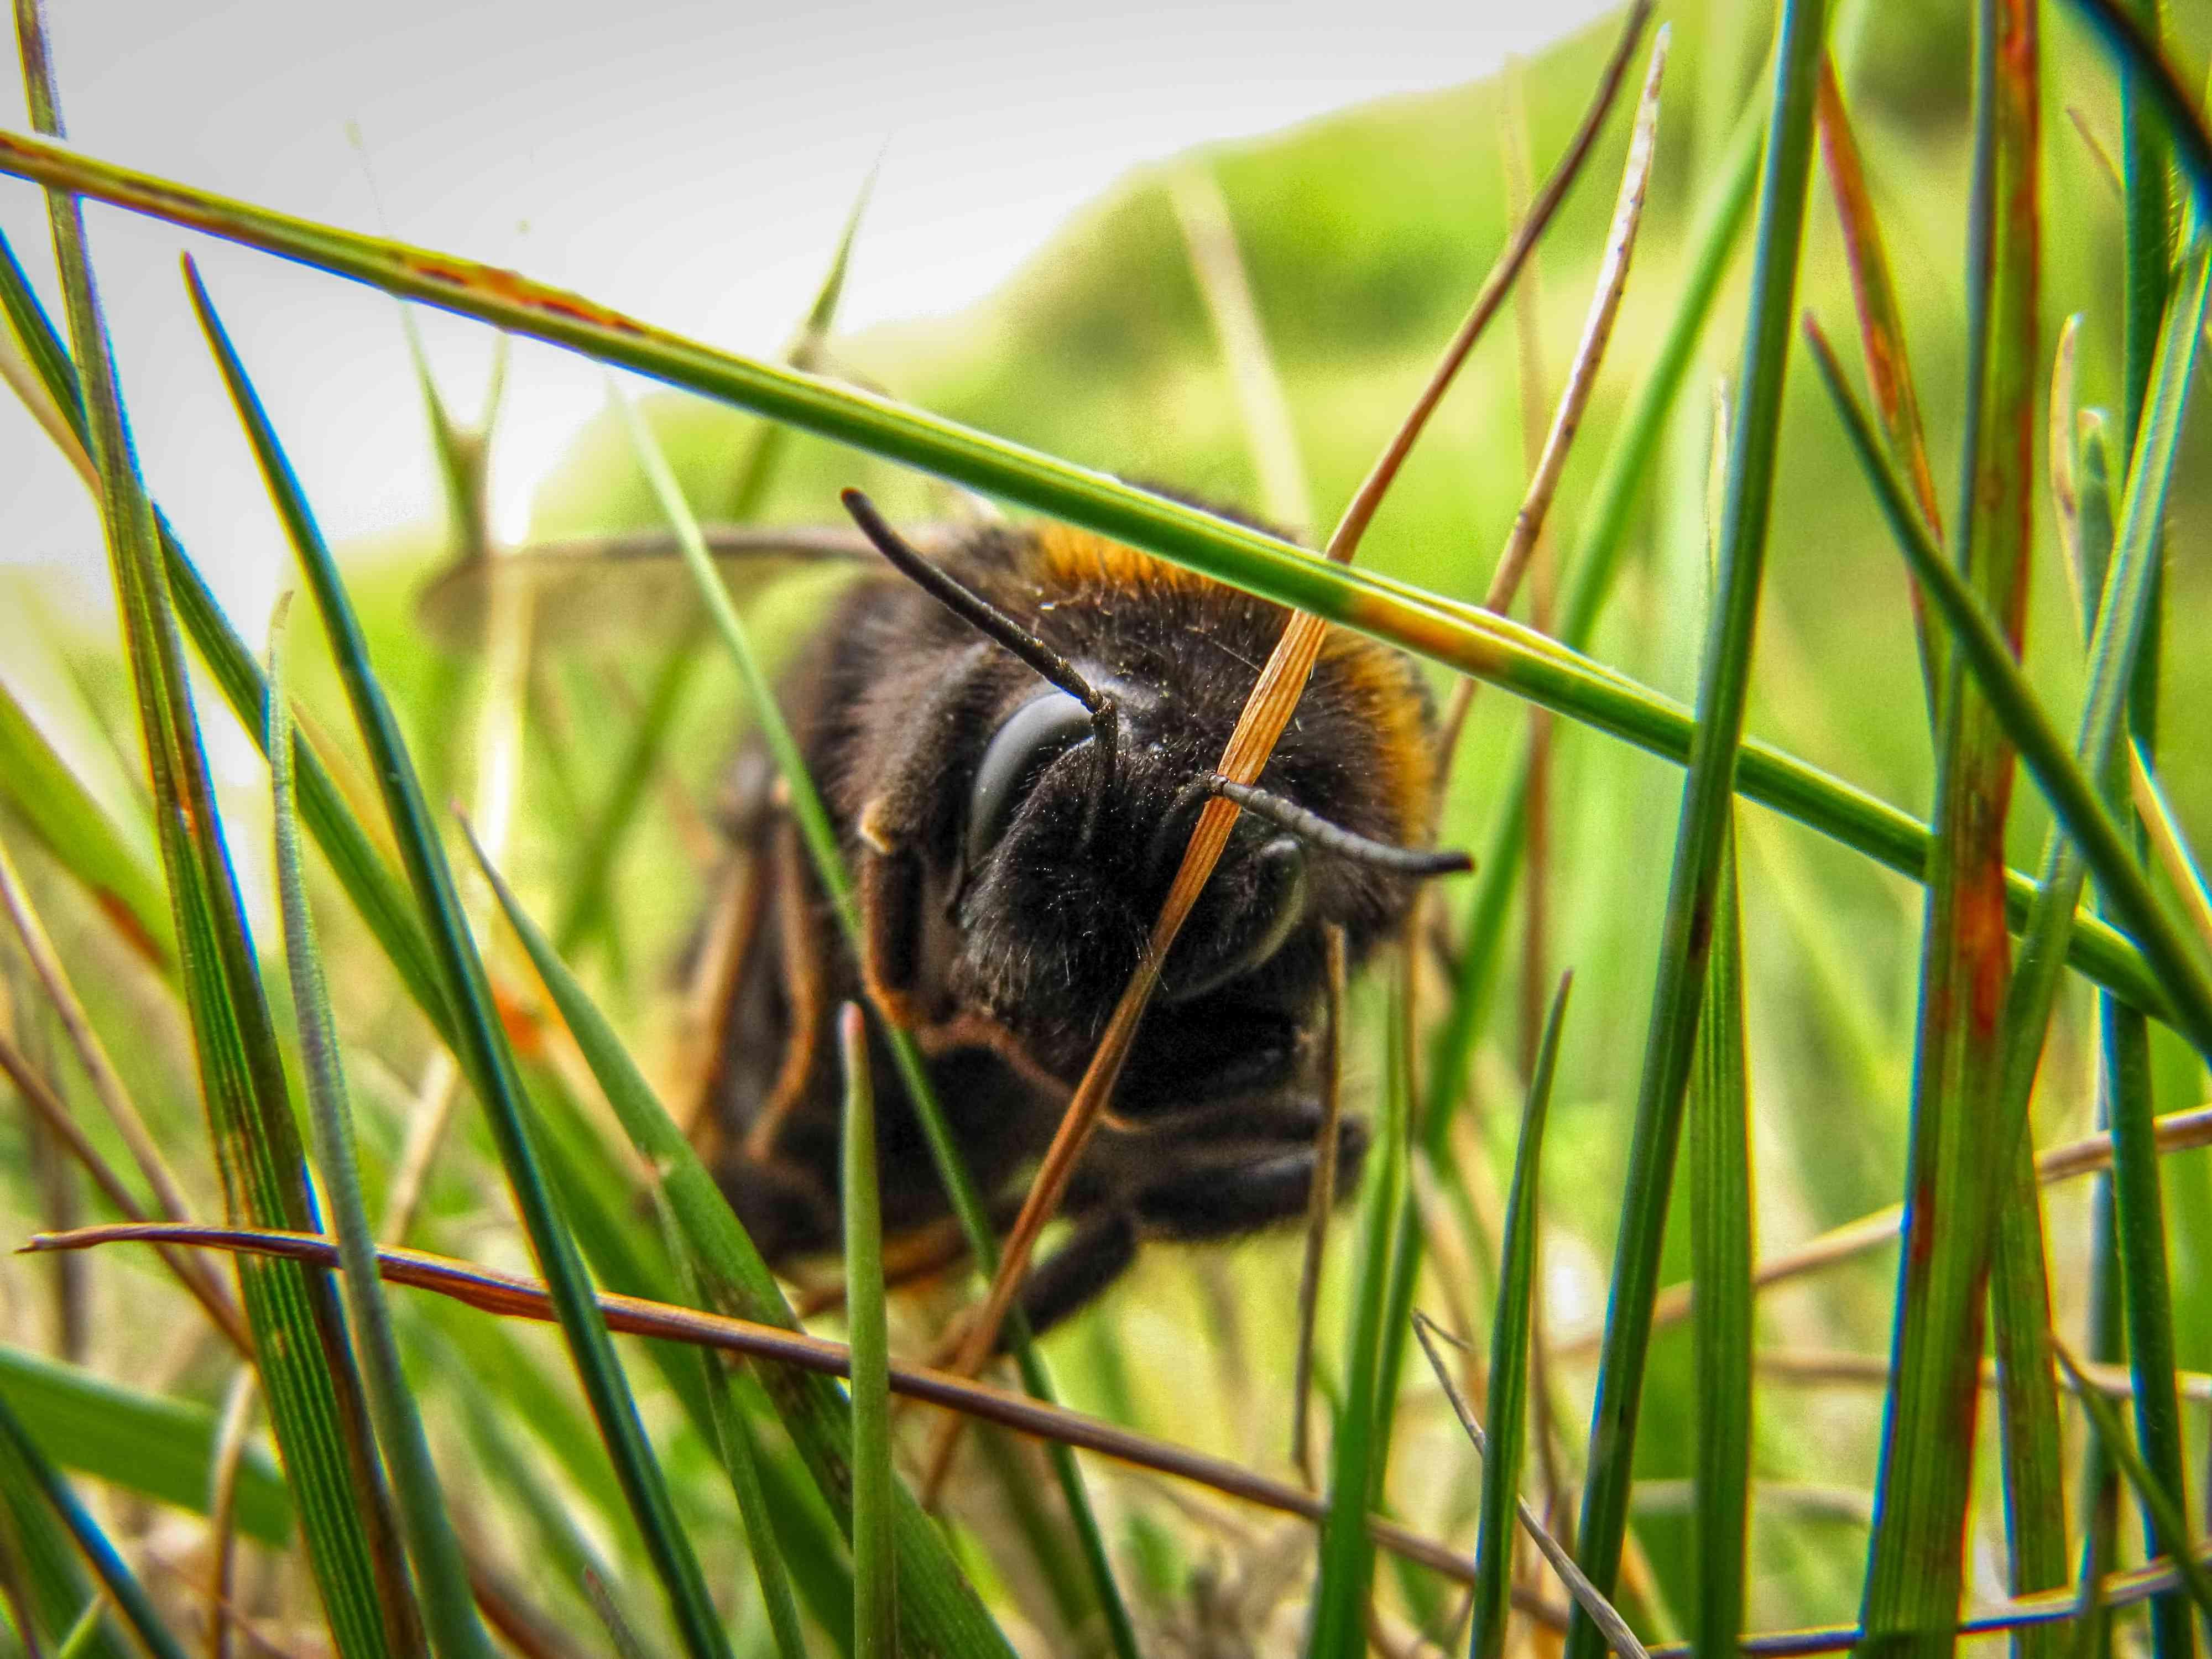 bumblebee in tall grass